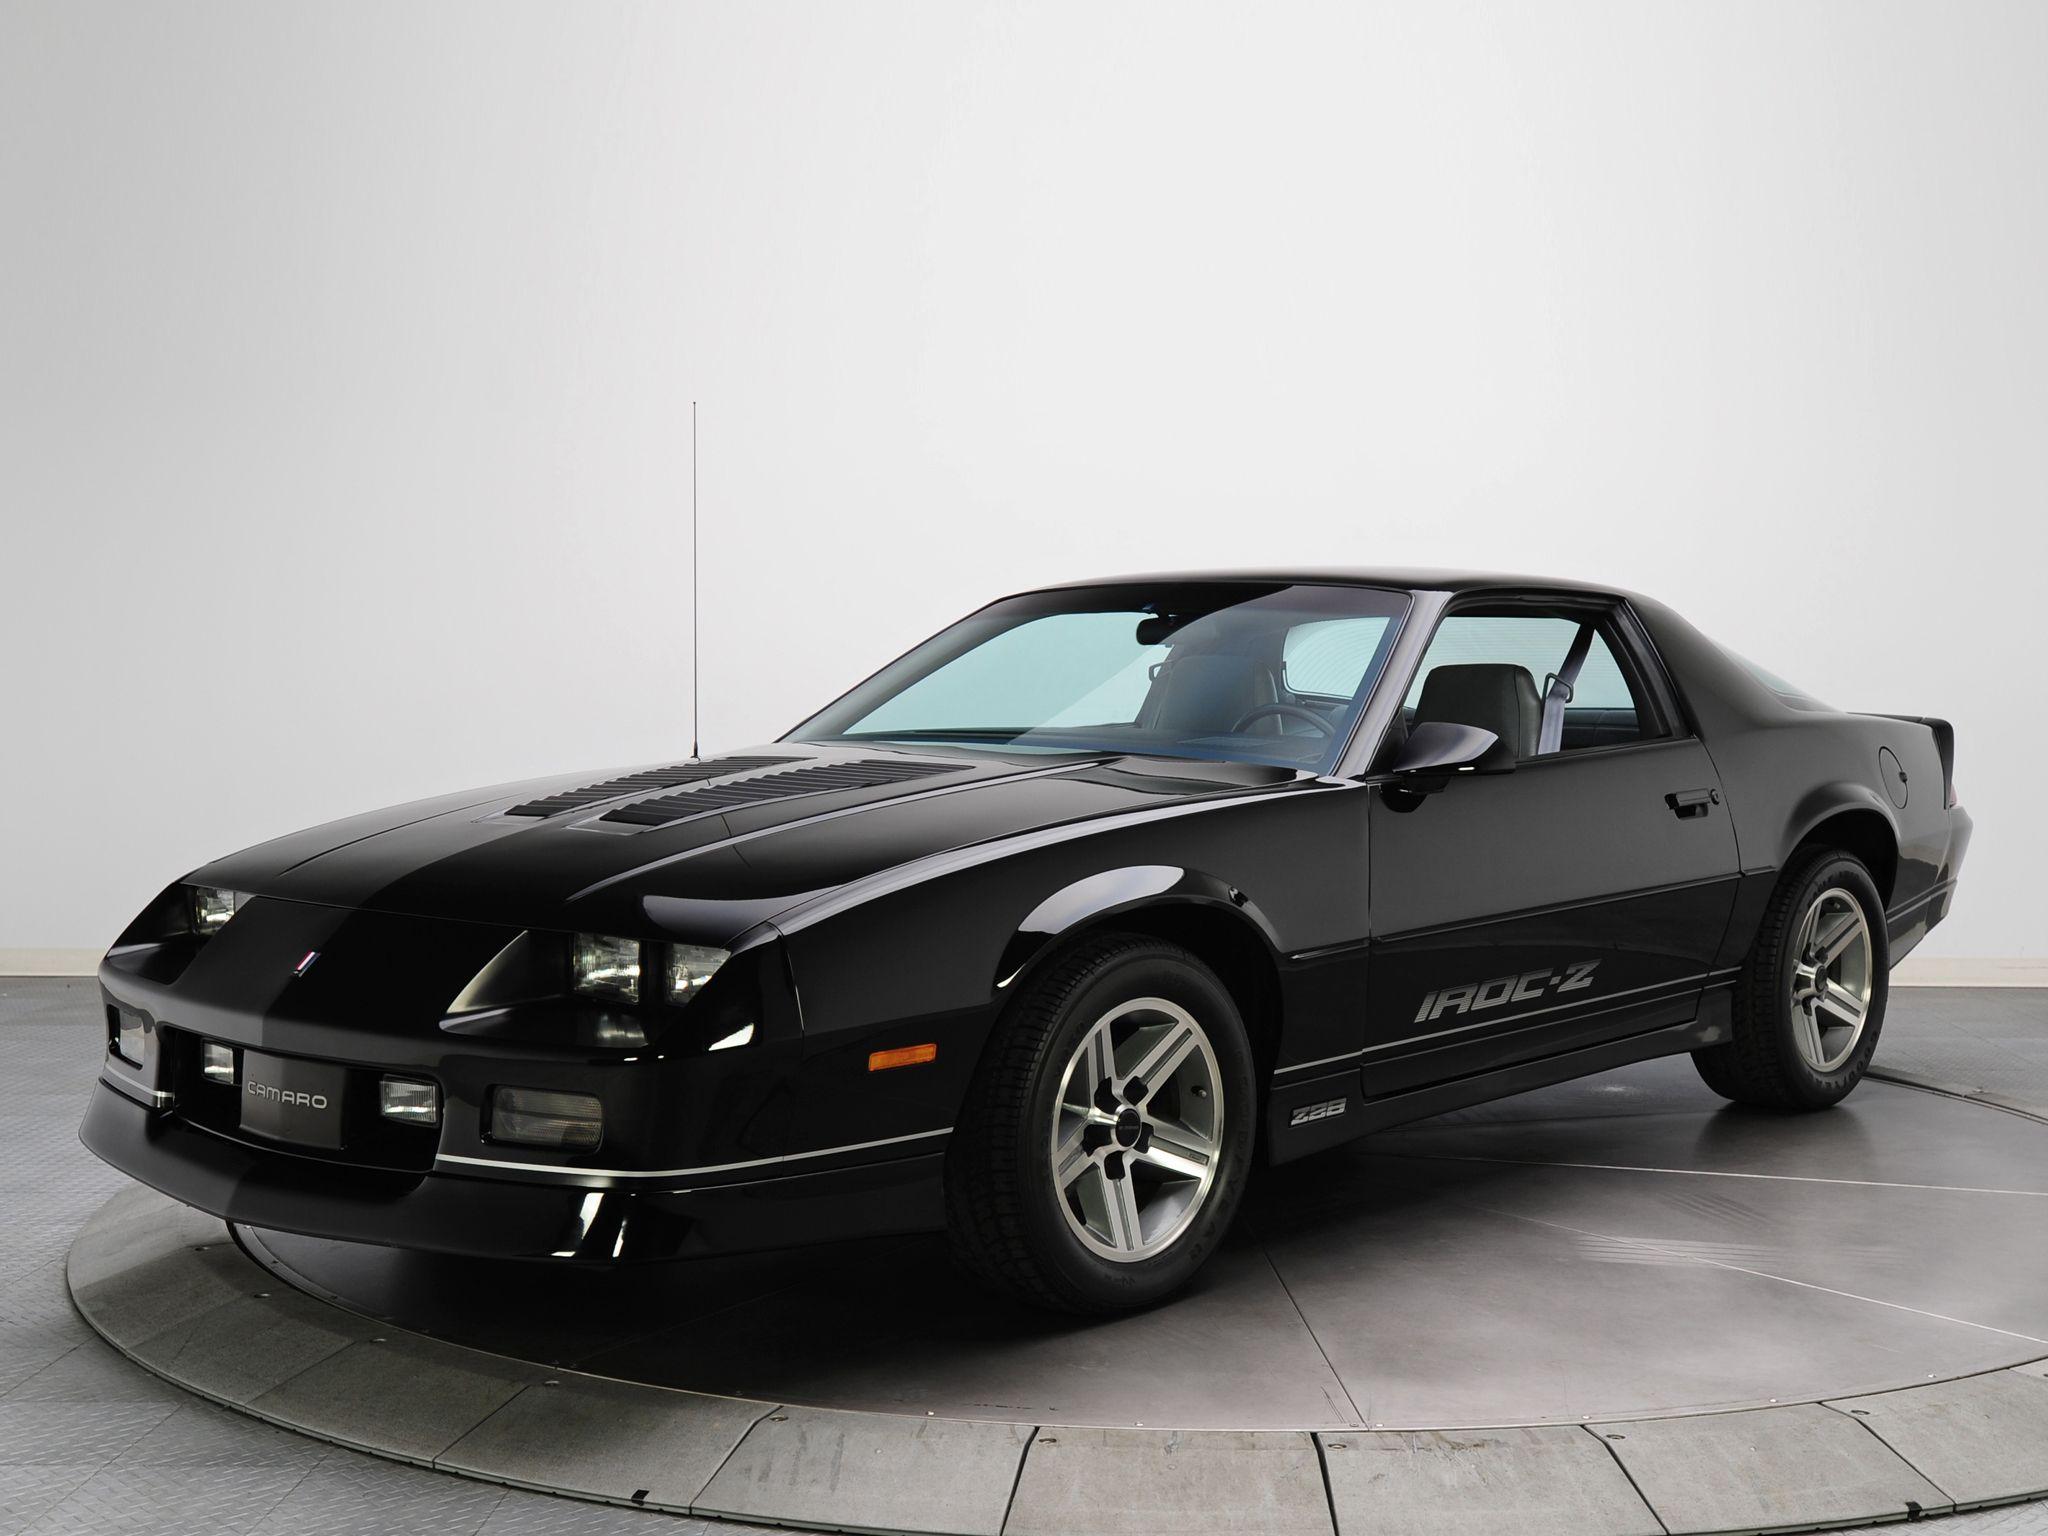 hight resolution of 1989 camaro iroc z black 1985 87 chevrolet camaro z28 iroc z